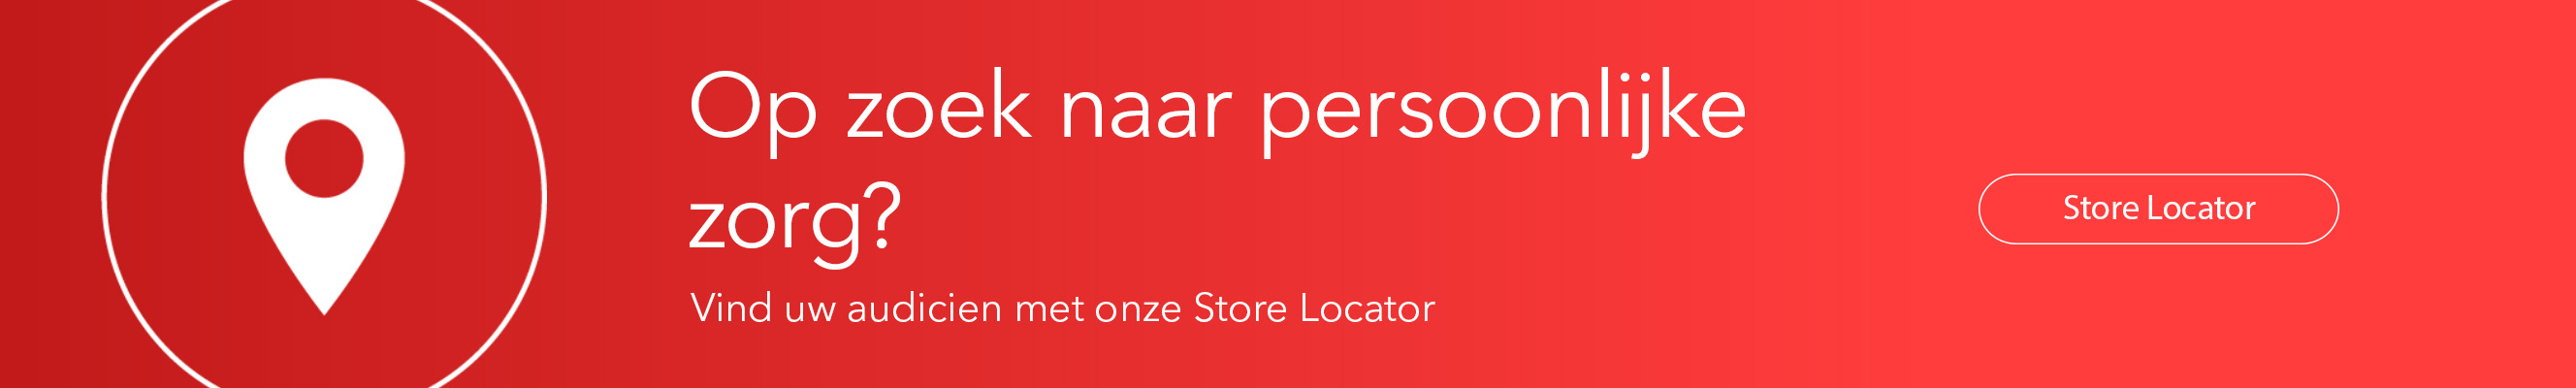 NL_StoreLocator_teaser_2656x400